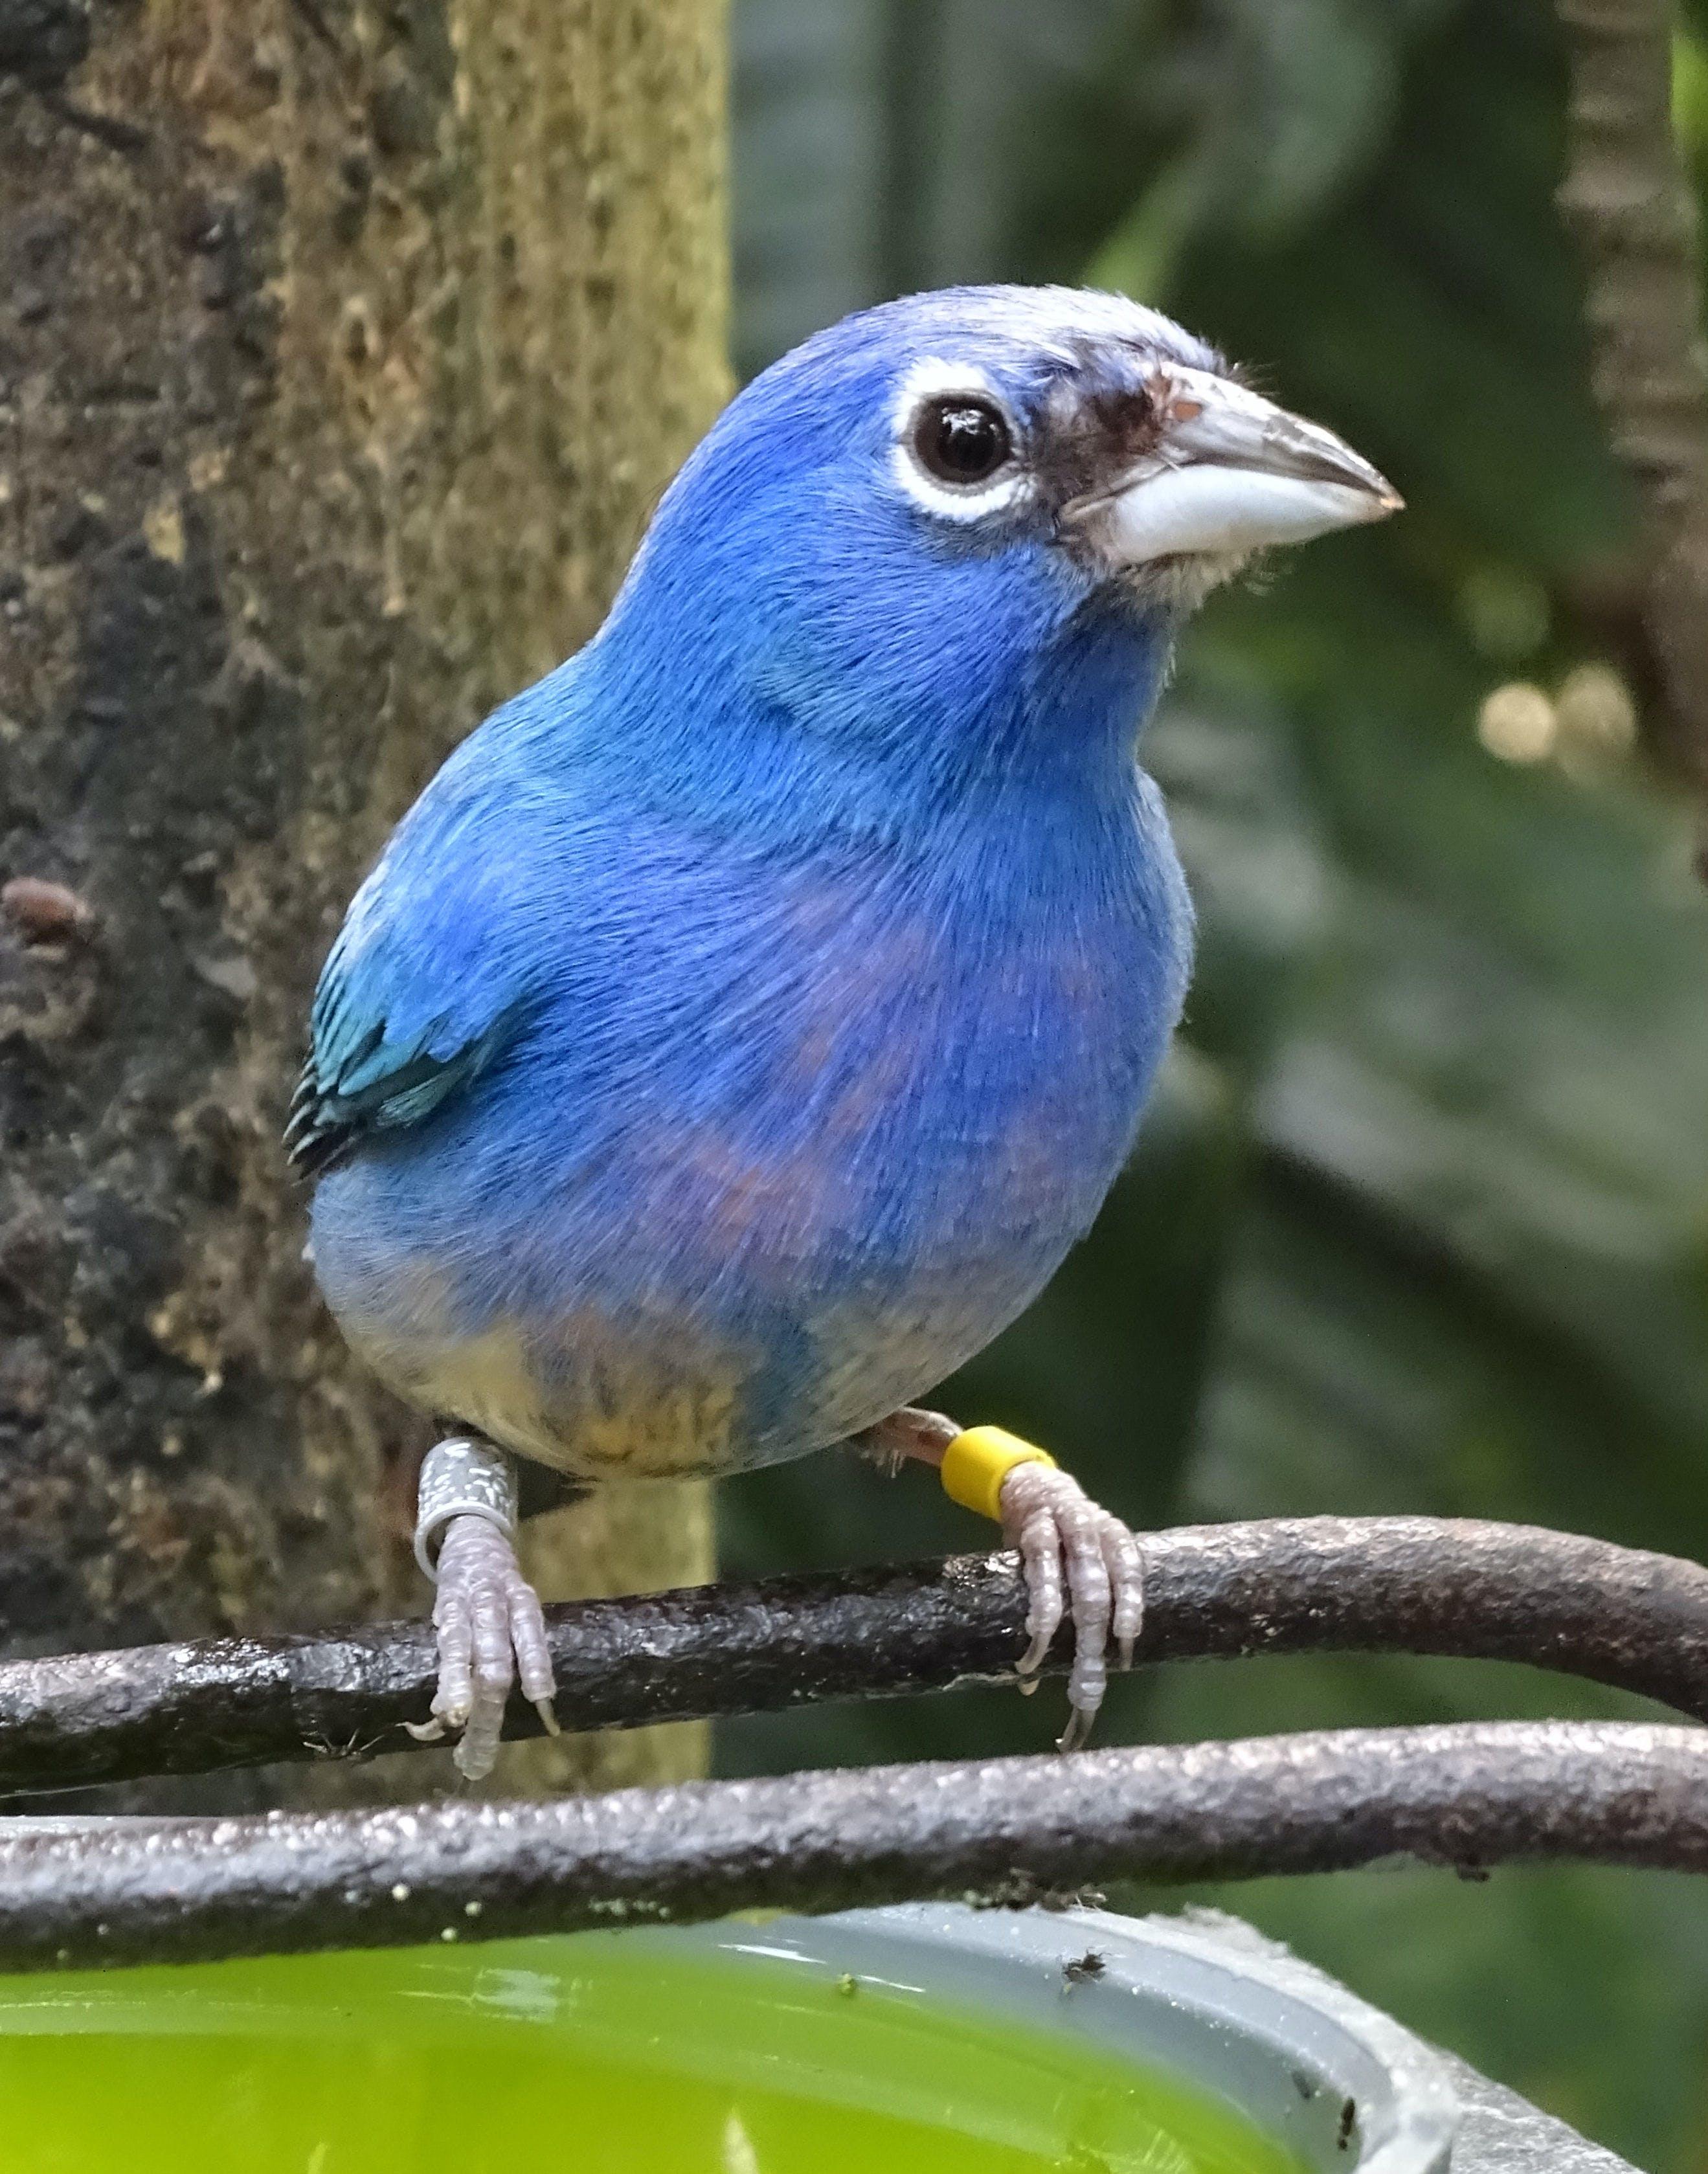 Blue Bird Perched on Black Metal Rod